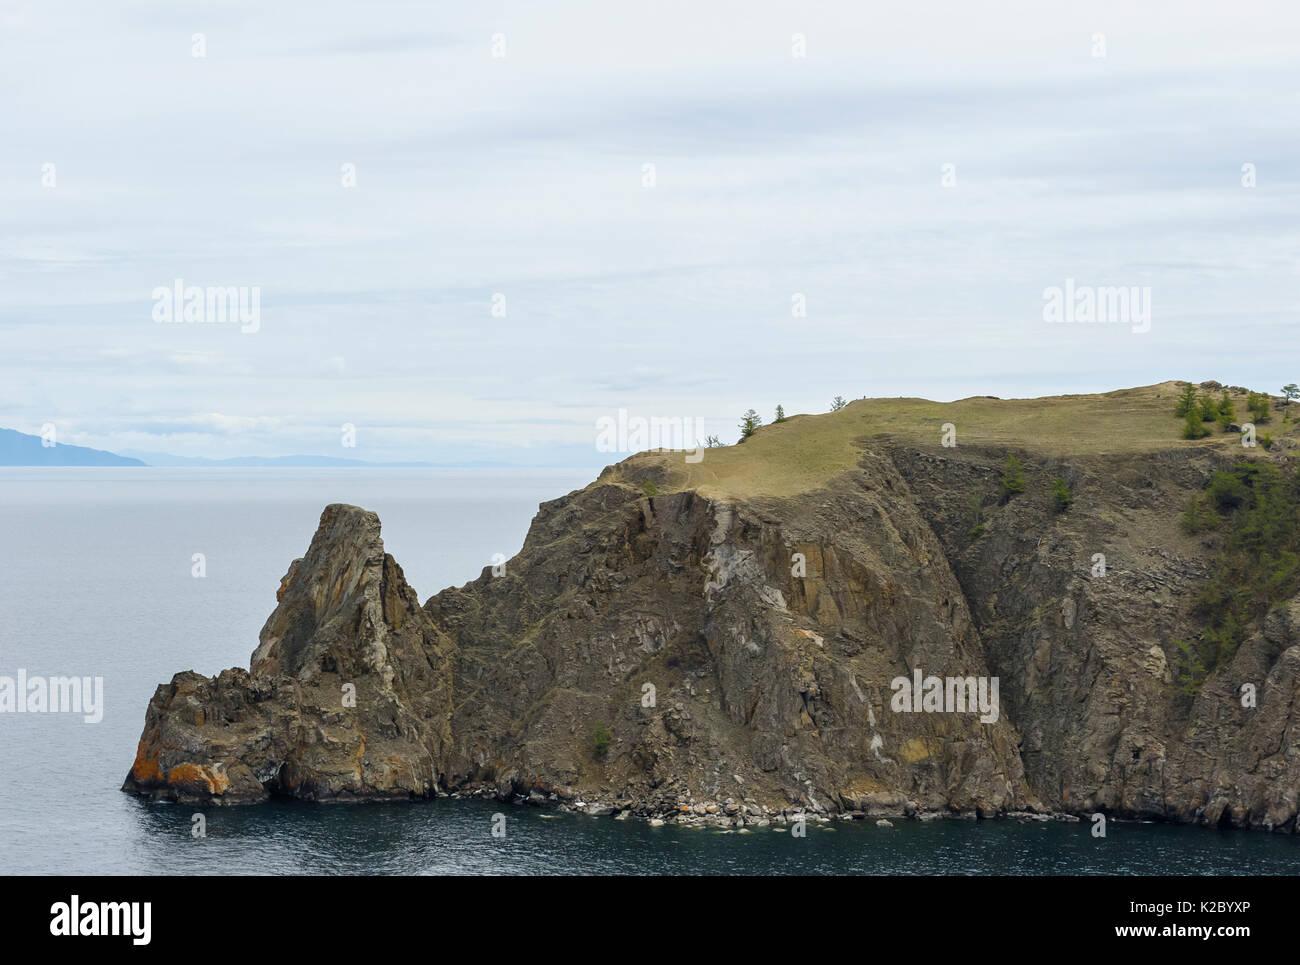 Cape Hoboy cliffs, Olkhon island, Lake Baikal, Russia, June 2014. - Stock Image